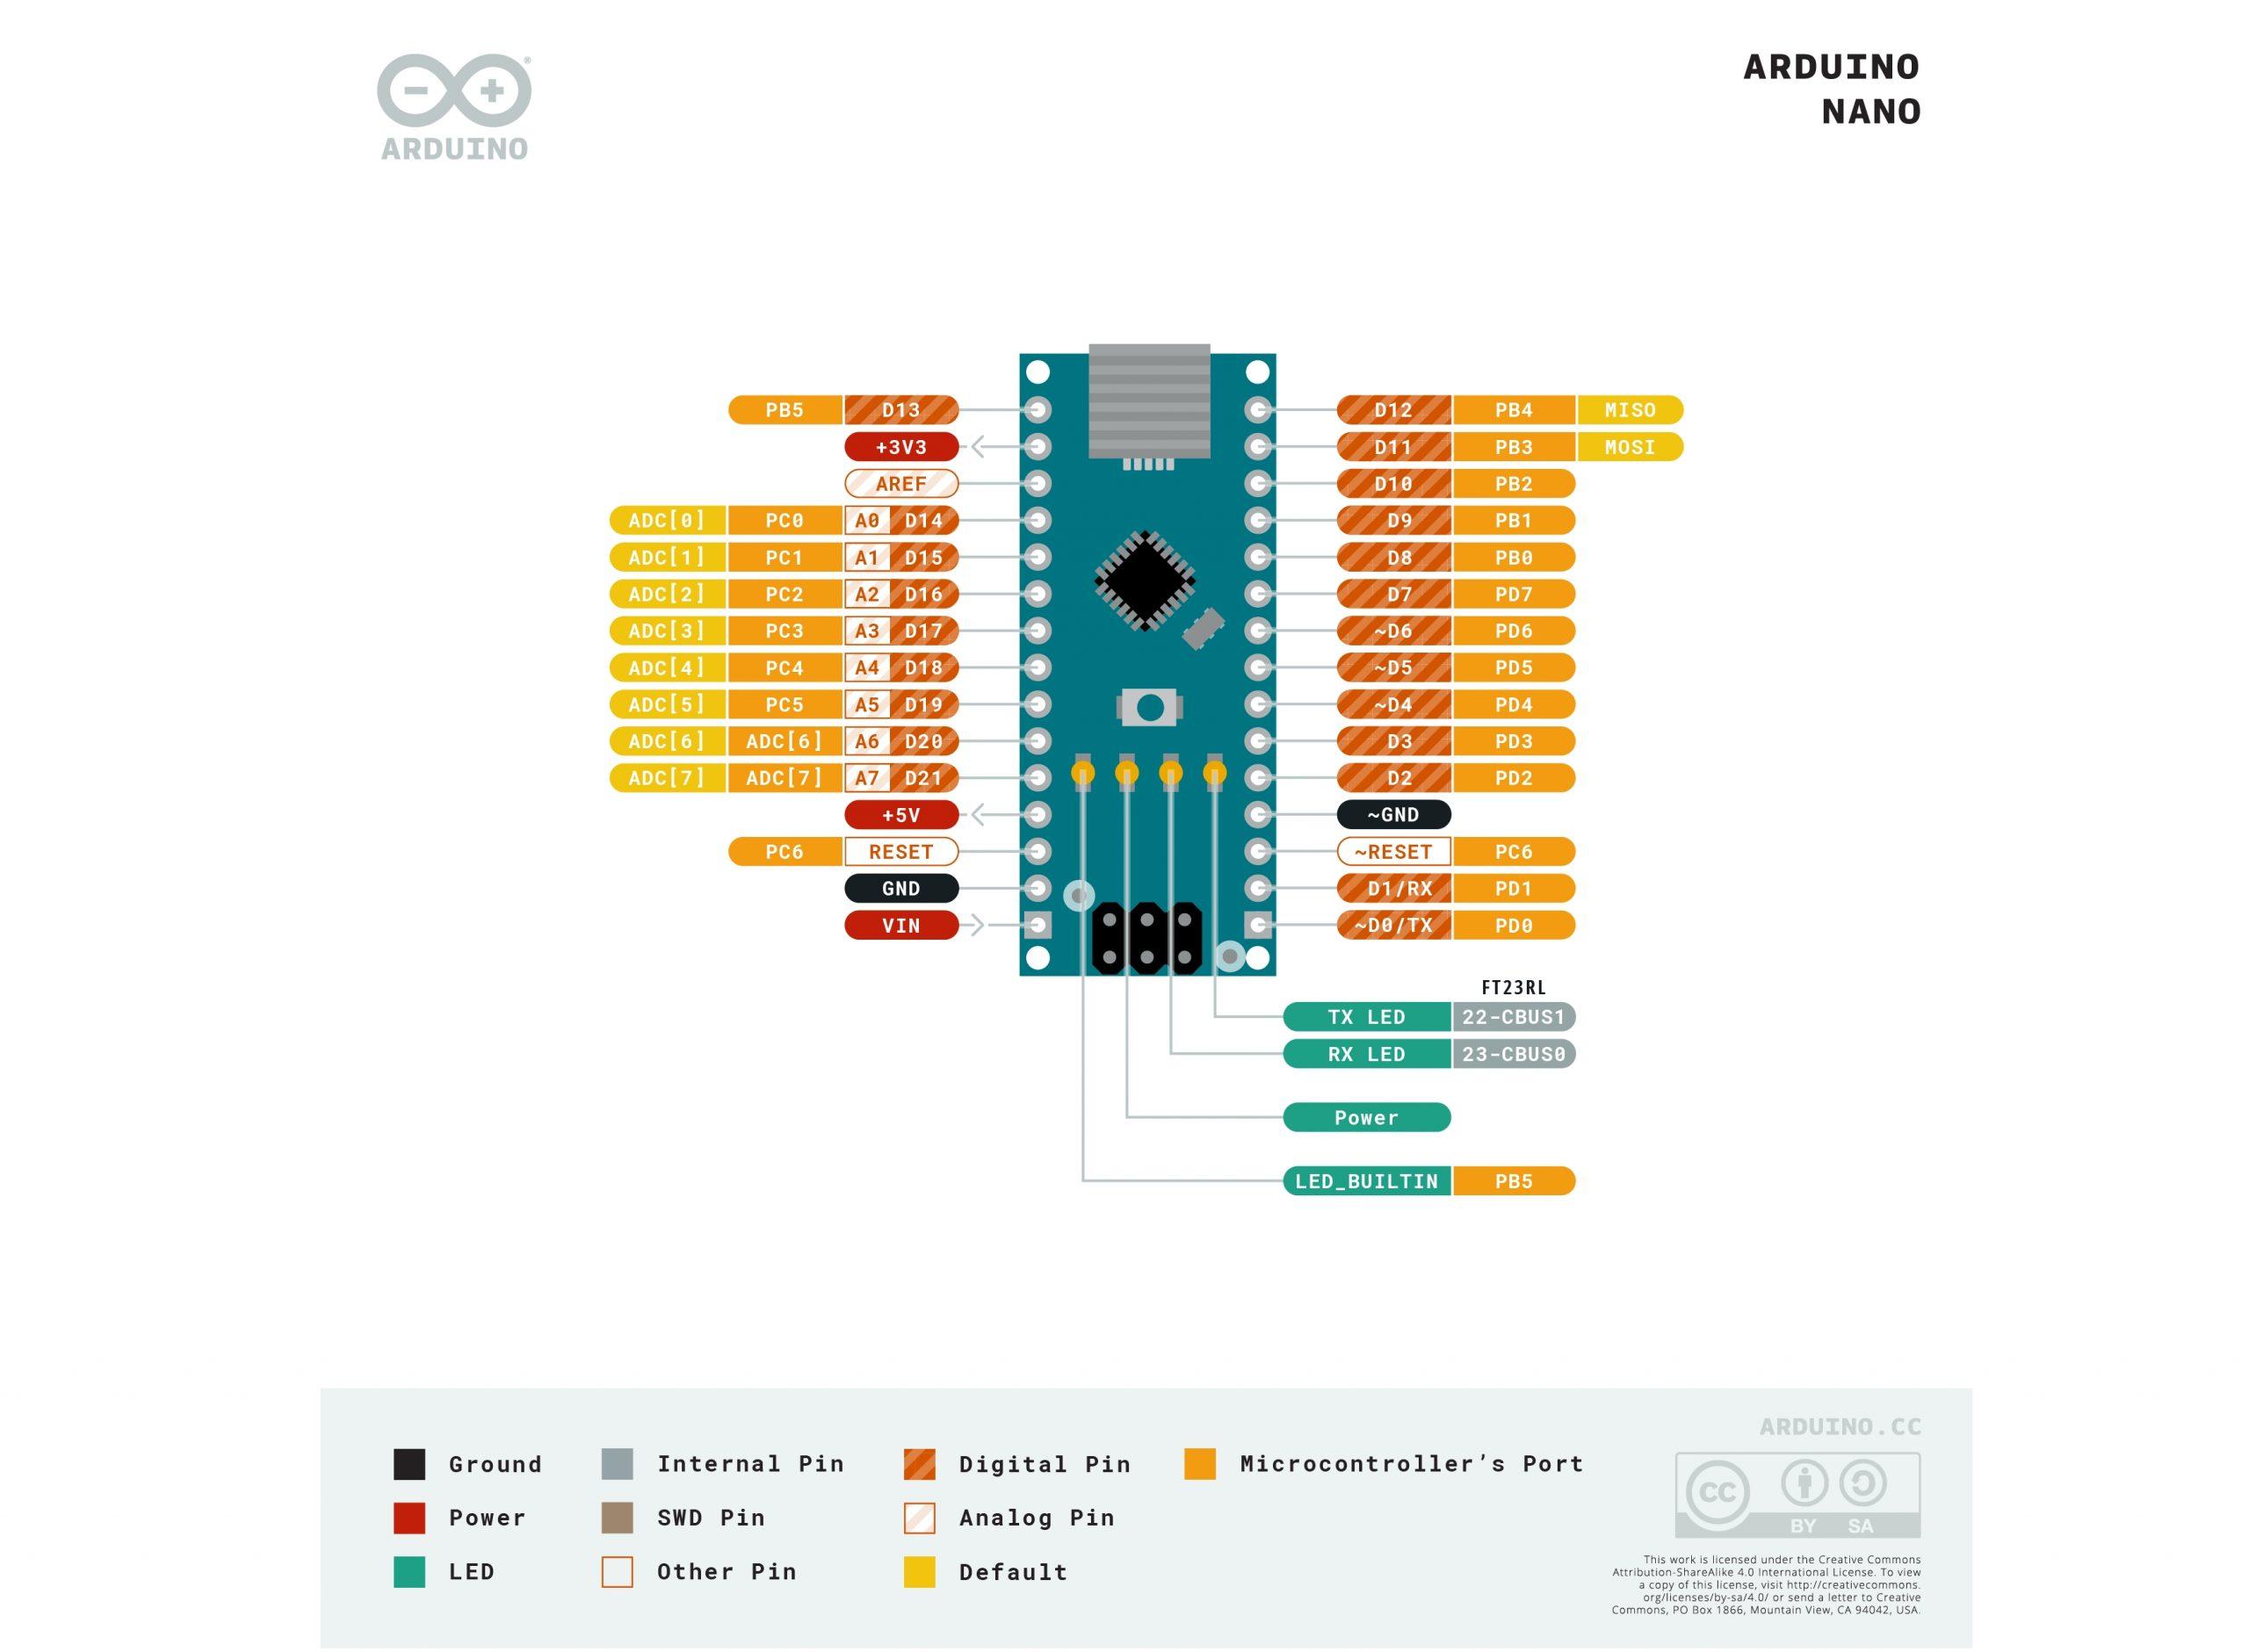 pinout Arduino Nano